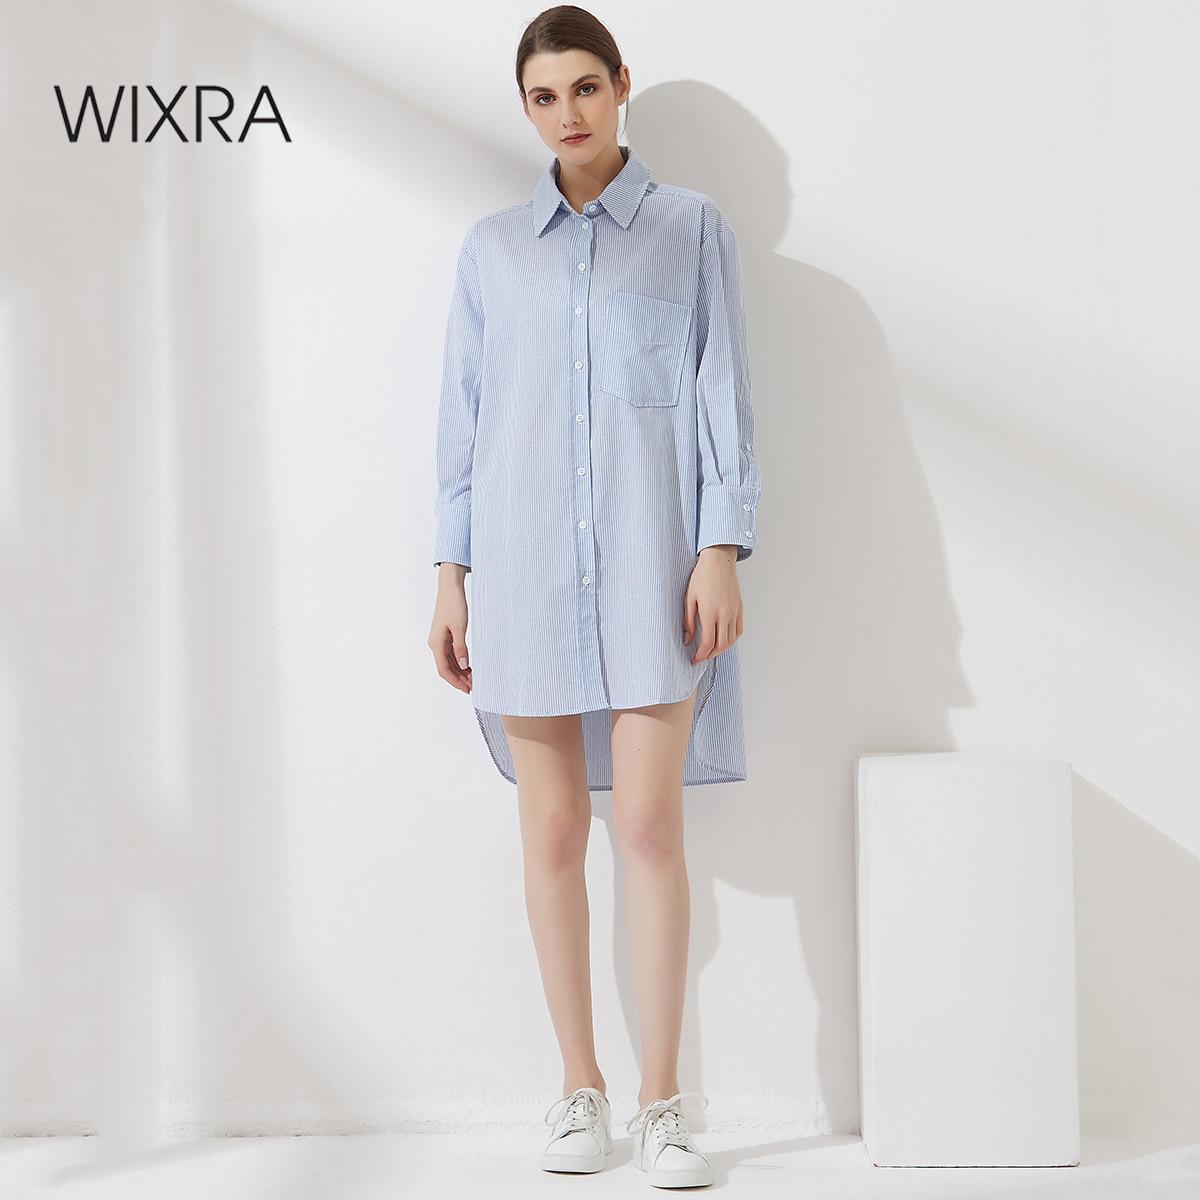 Wixra إمرأة بلوزة مخططة المتضخم كم طويل رفض طوق جيوب قمصان الخريف الربيع النمط الفرنسي بلايز سيدة